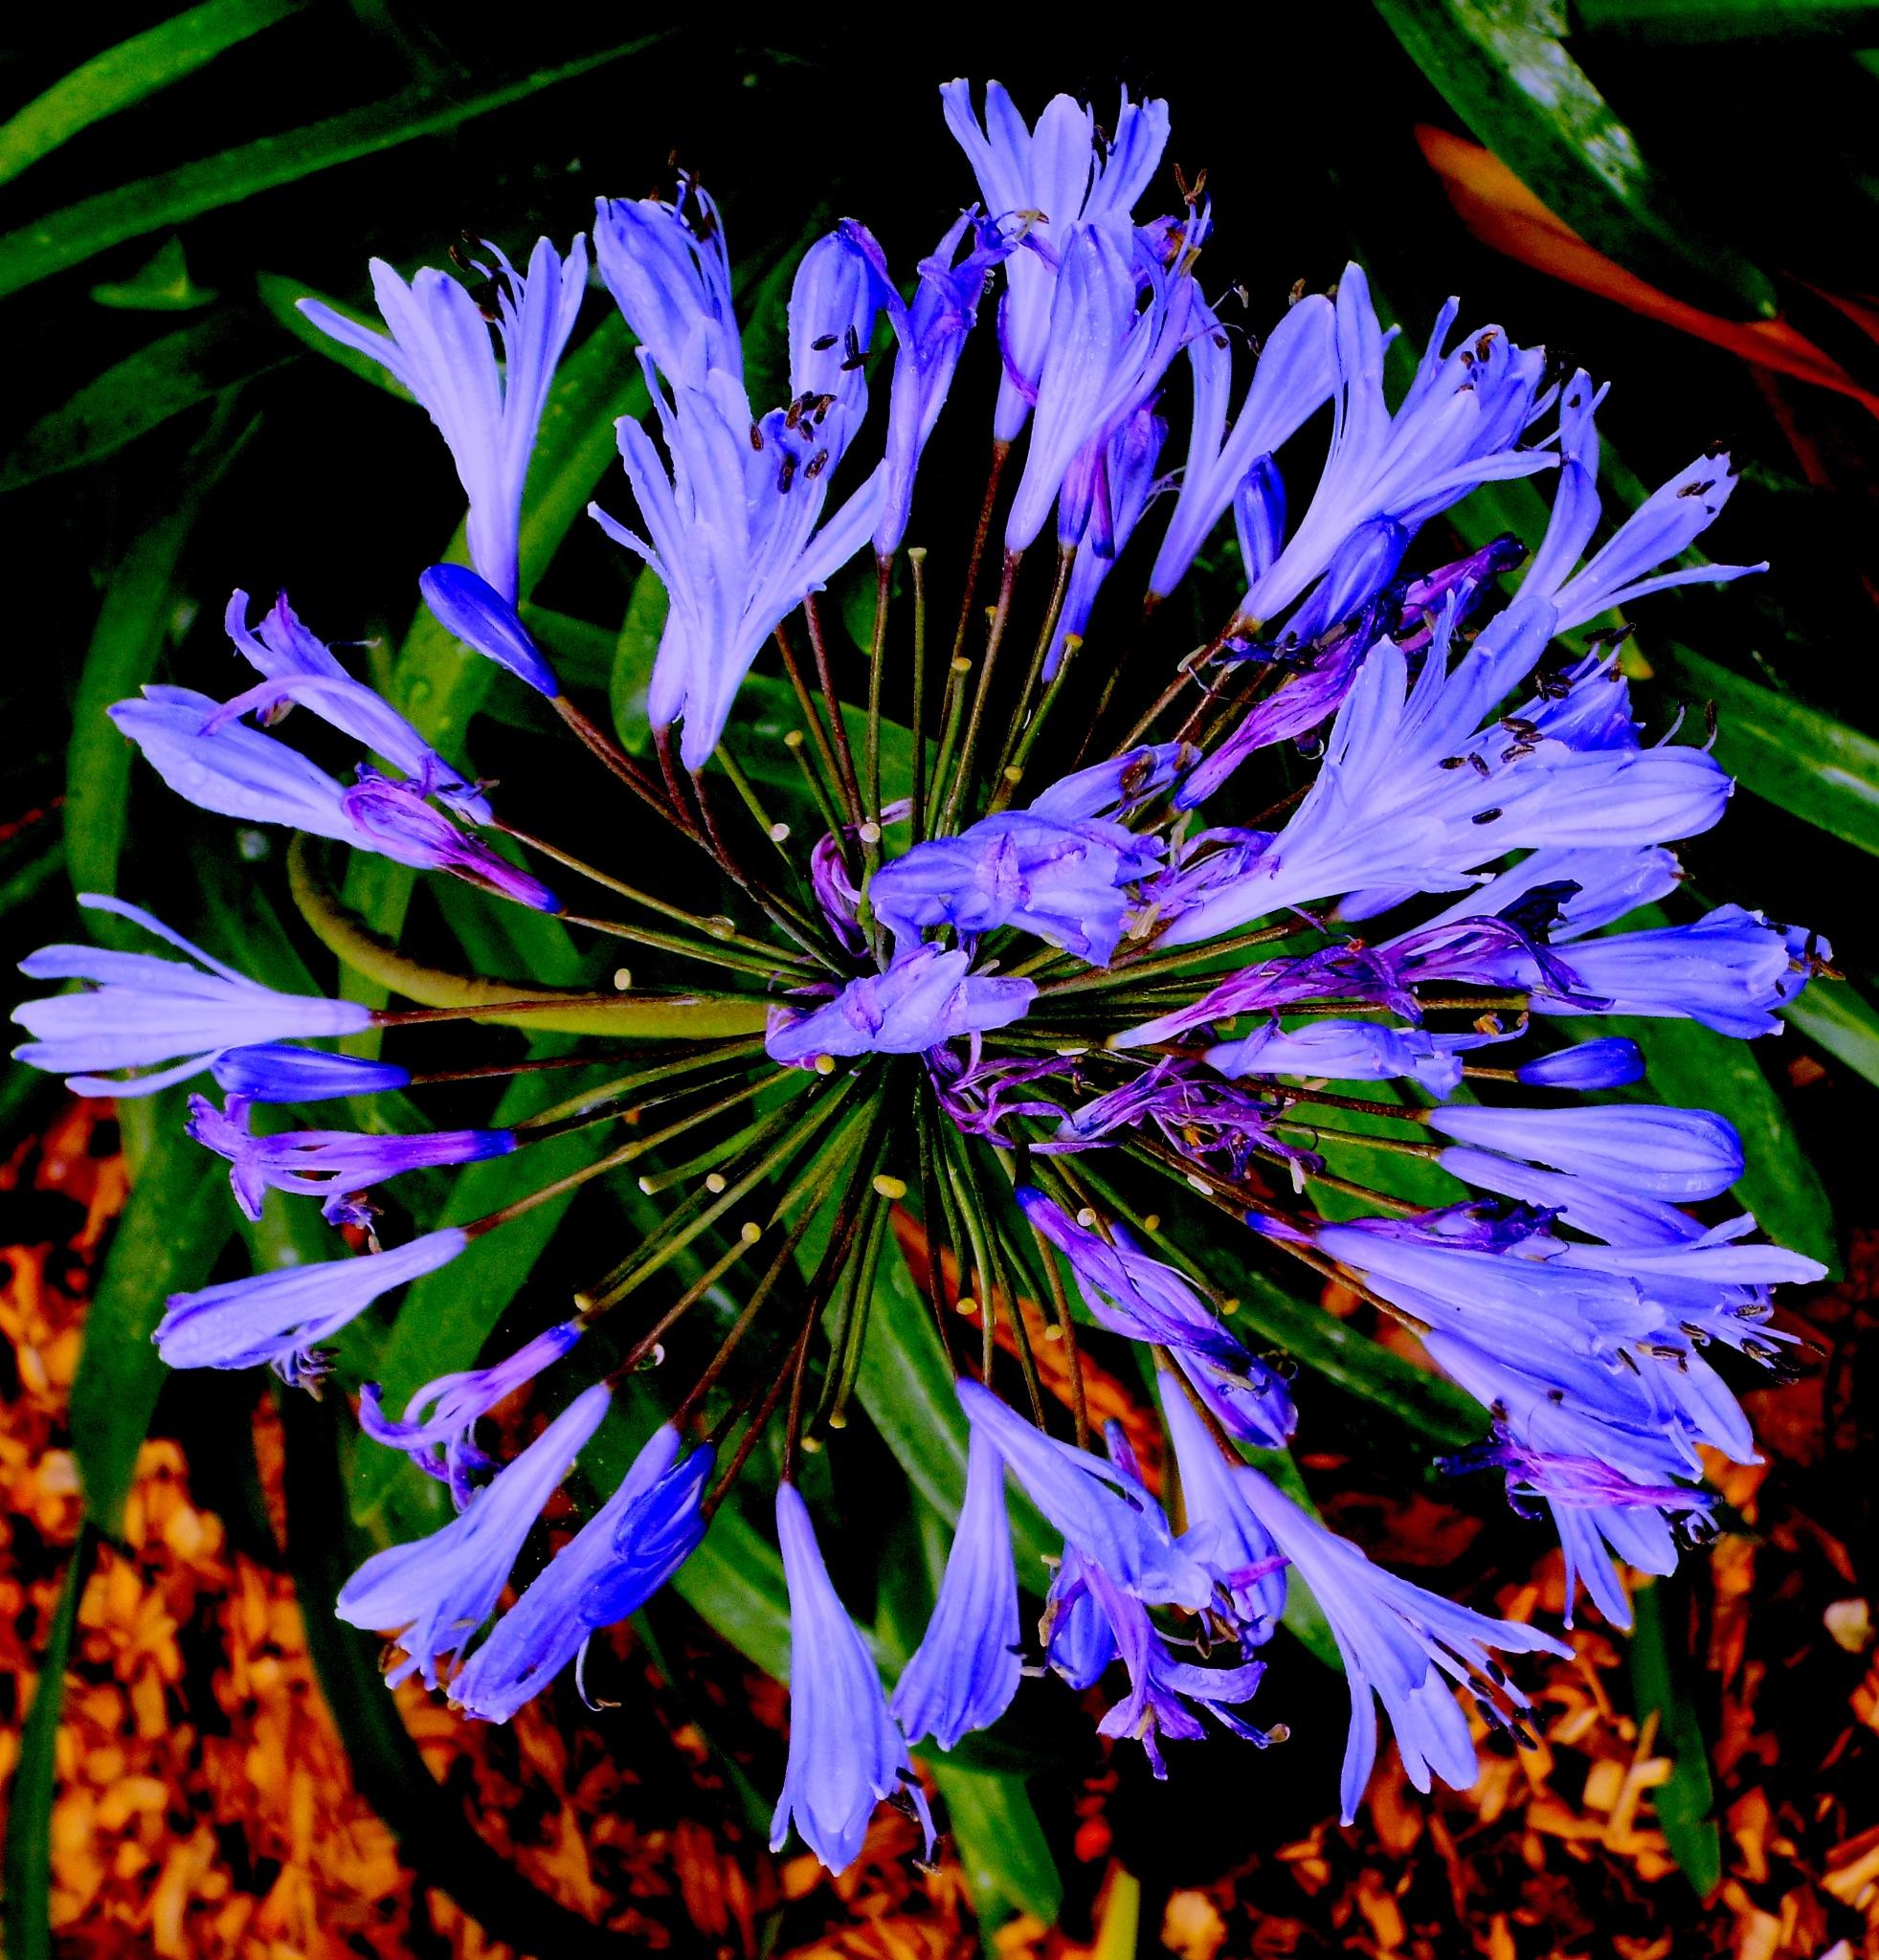 WILD FLOWER,  DEEP BLUE DOUGLAS IRIS, FULL SCREEN by Akin Saner